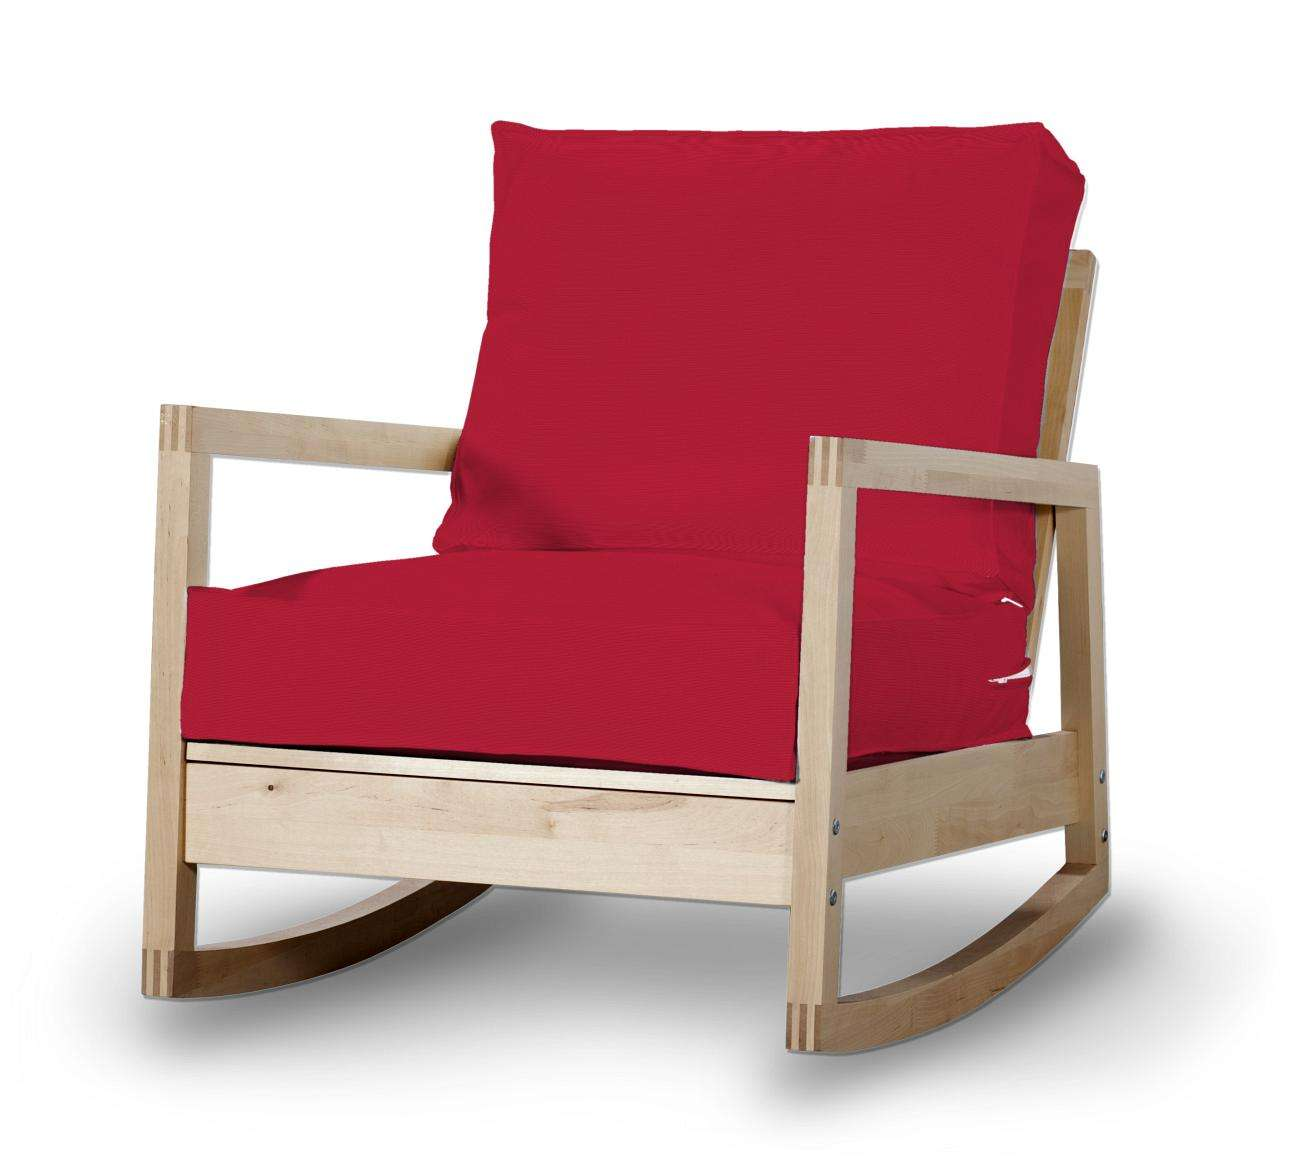 Lillberg Sesselbezug Sesselhusse, Modell Lillberg von der Kollektion Cotton Panama, Stoff: 702-04